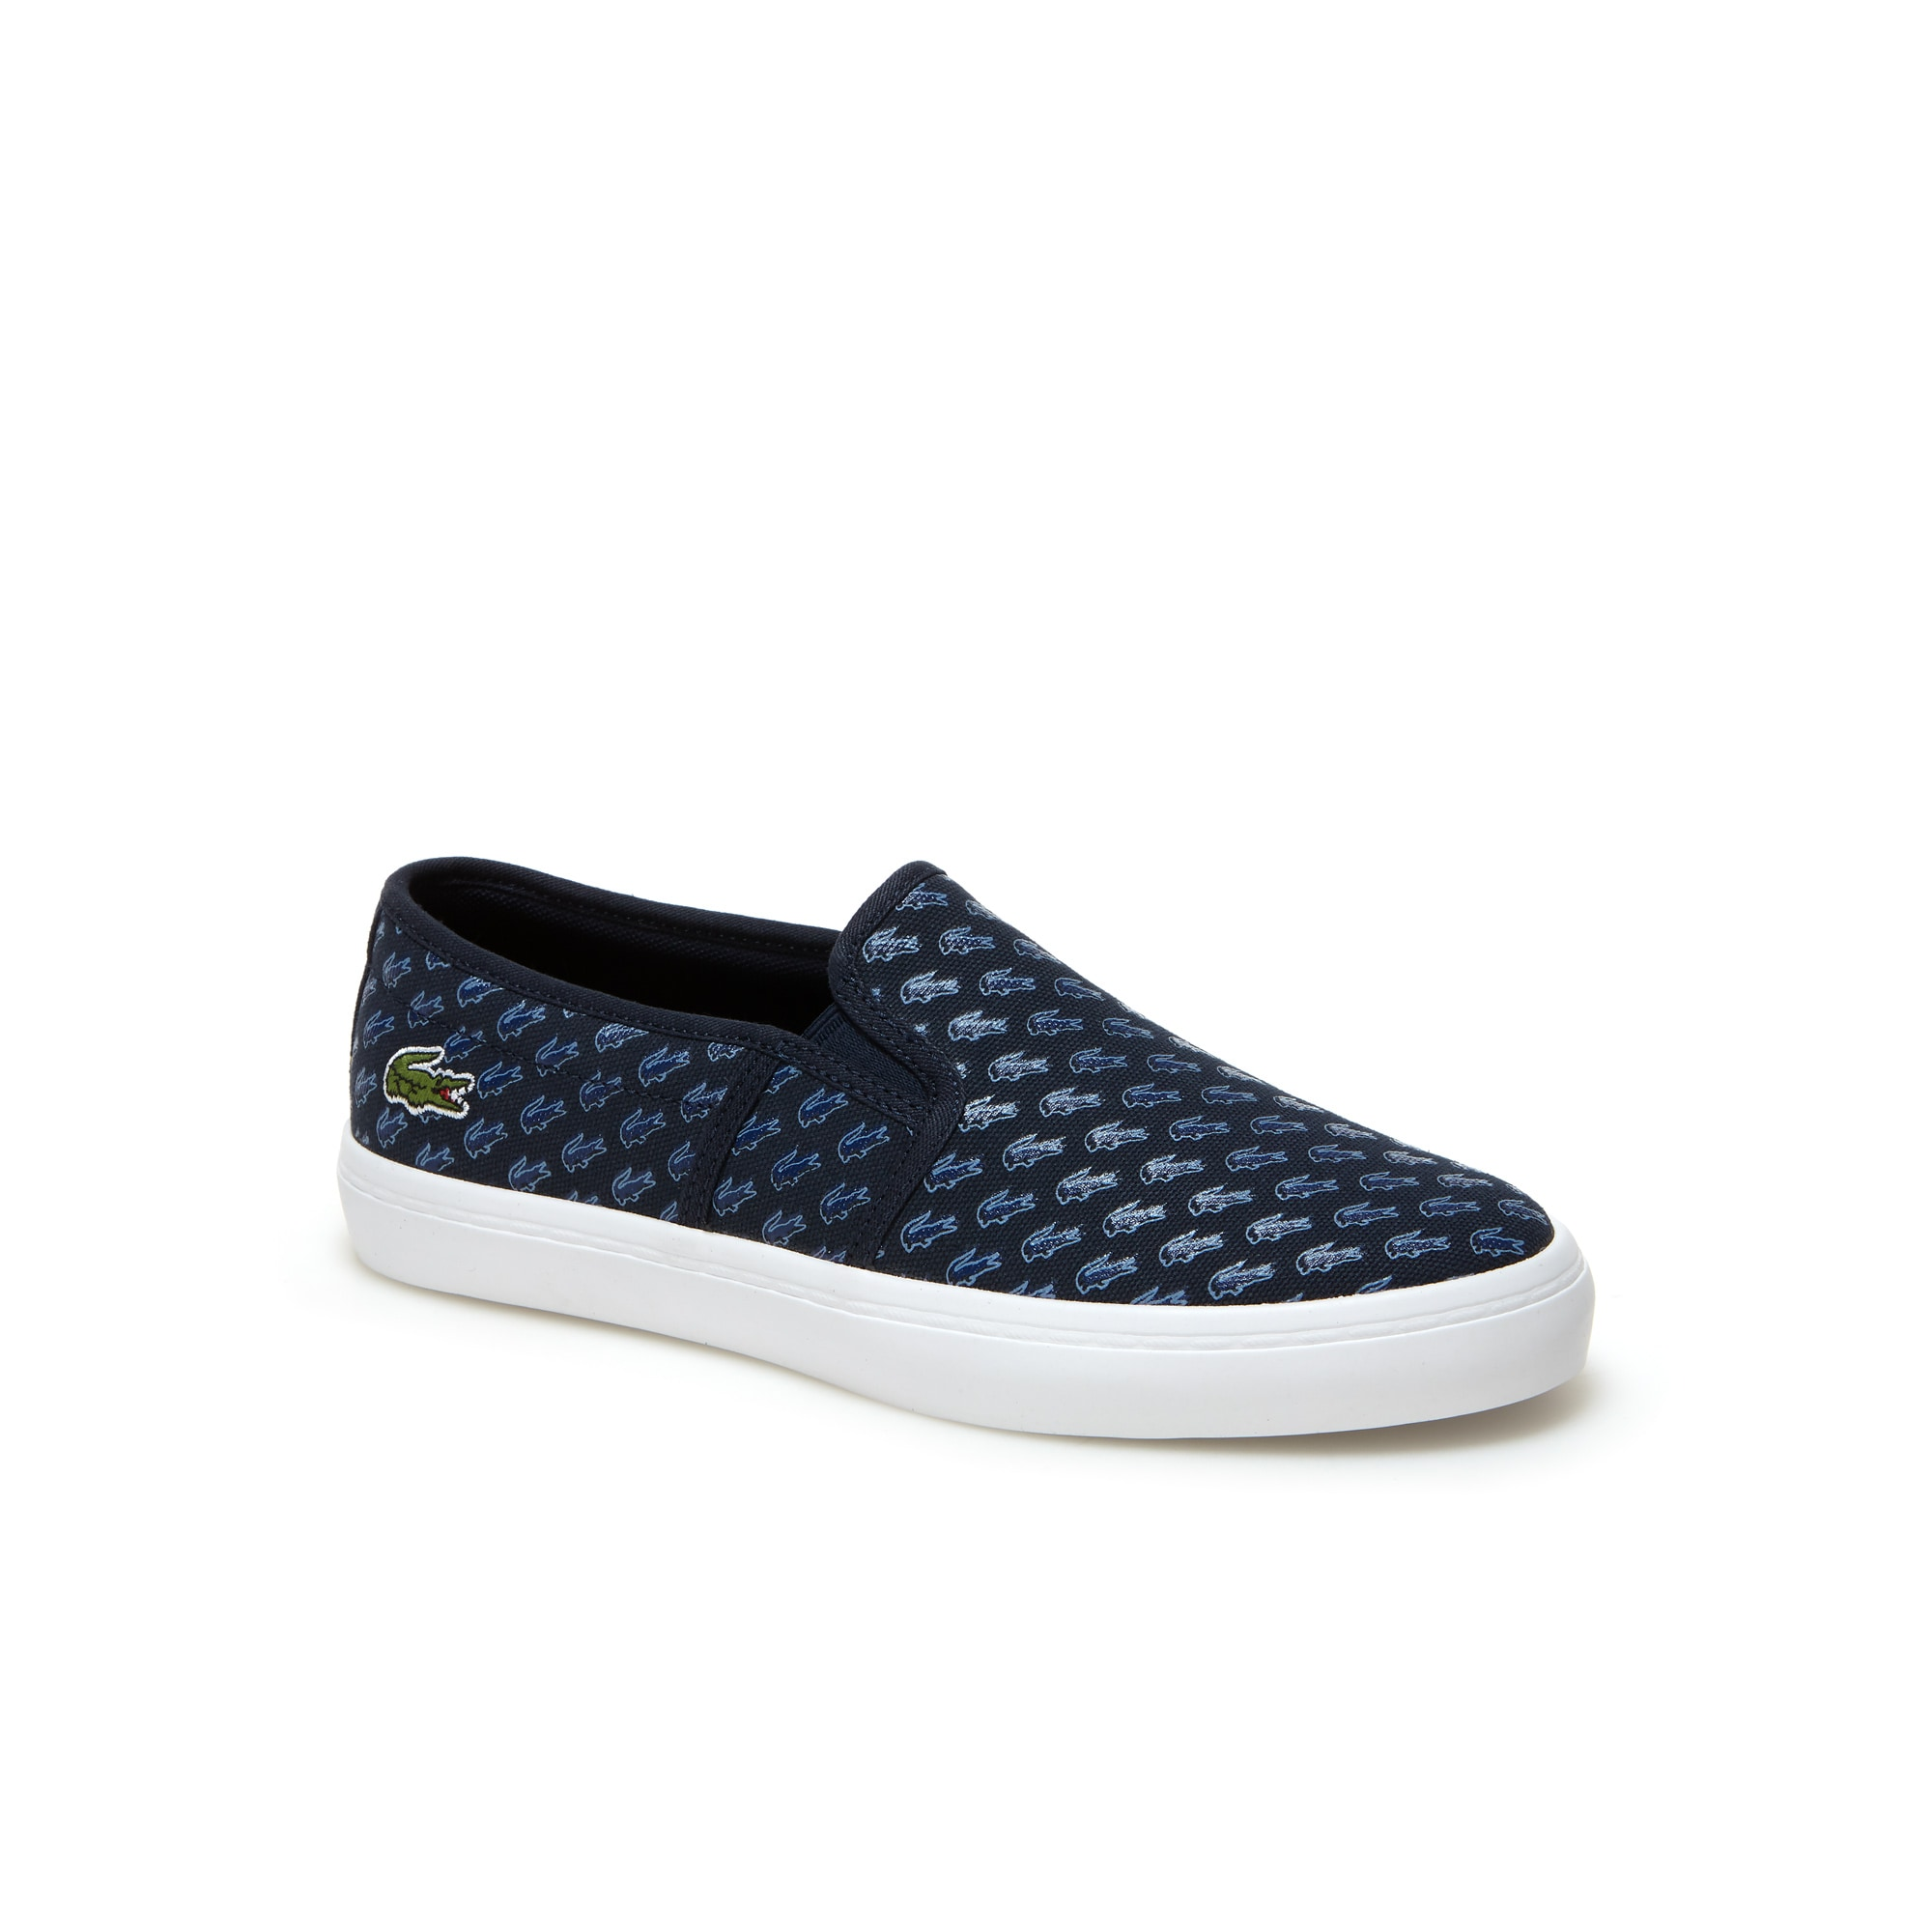 Sneakers senza stringhe Gazon in tela